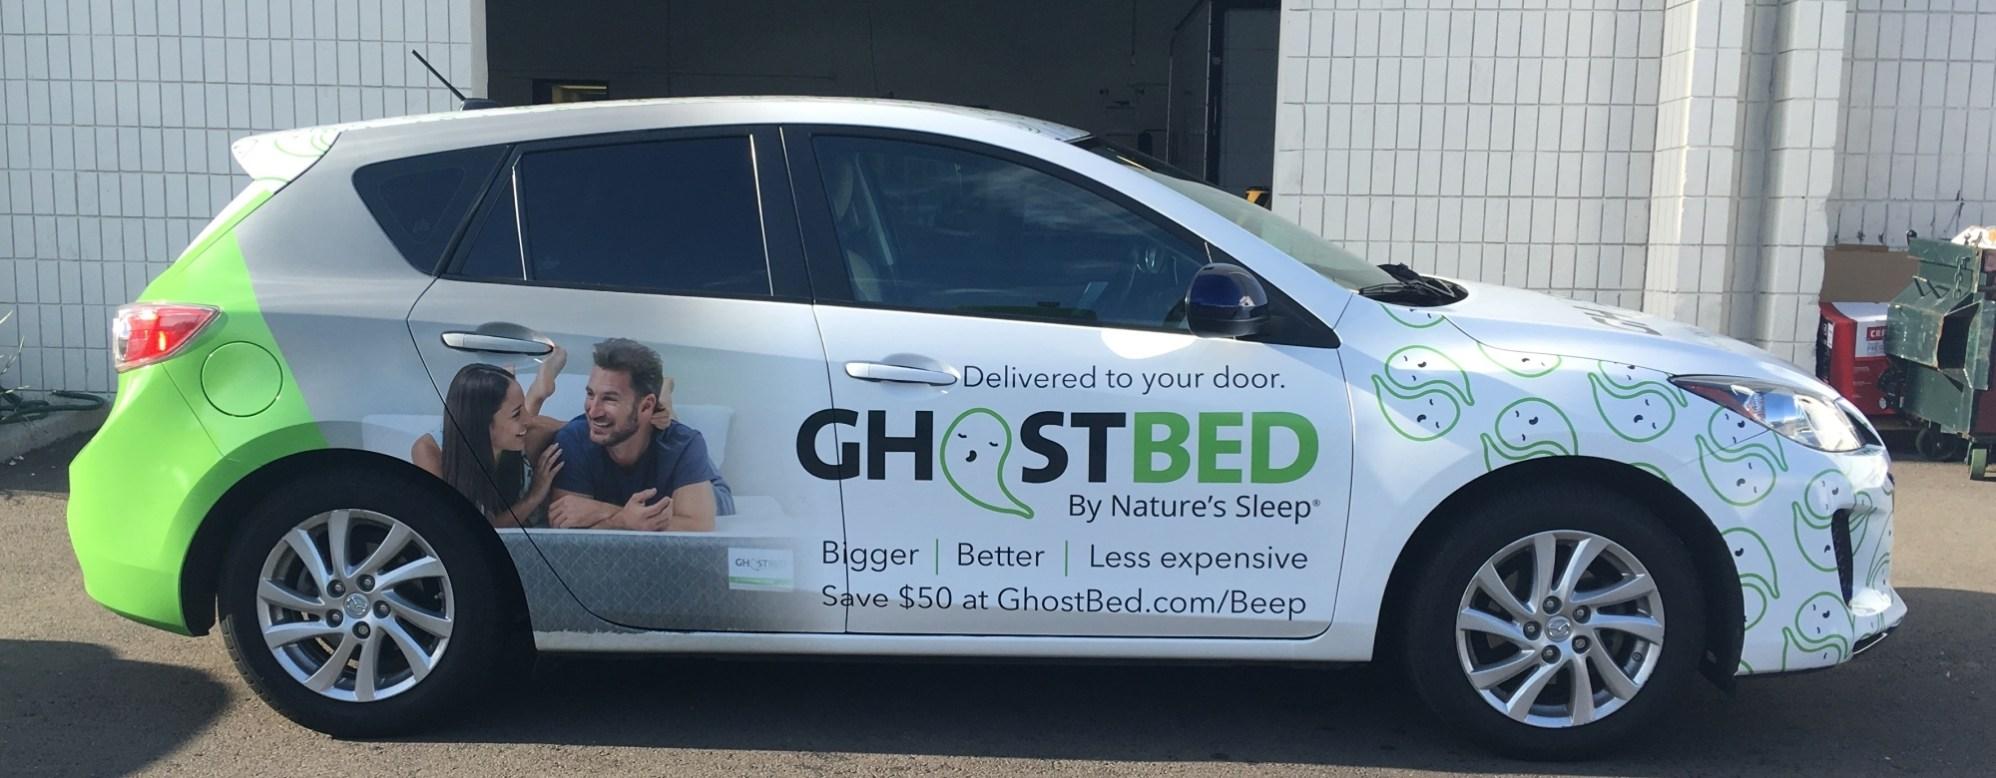 ghostbed fleet wrap 09